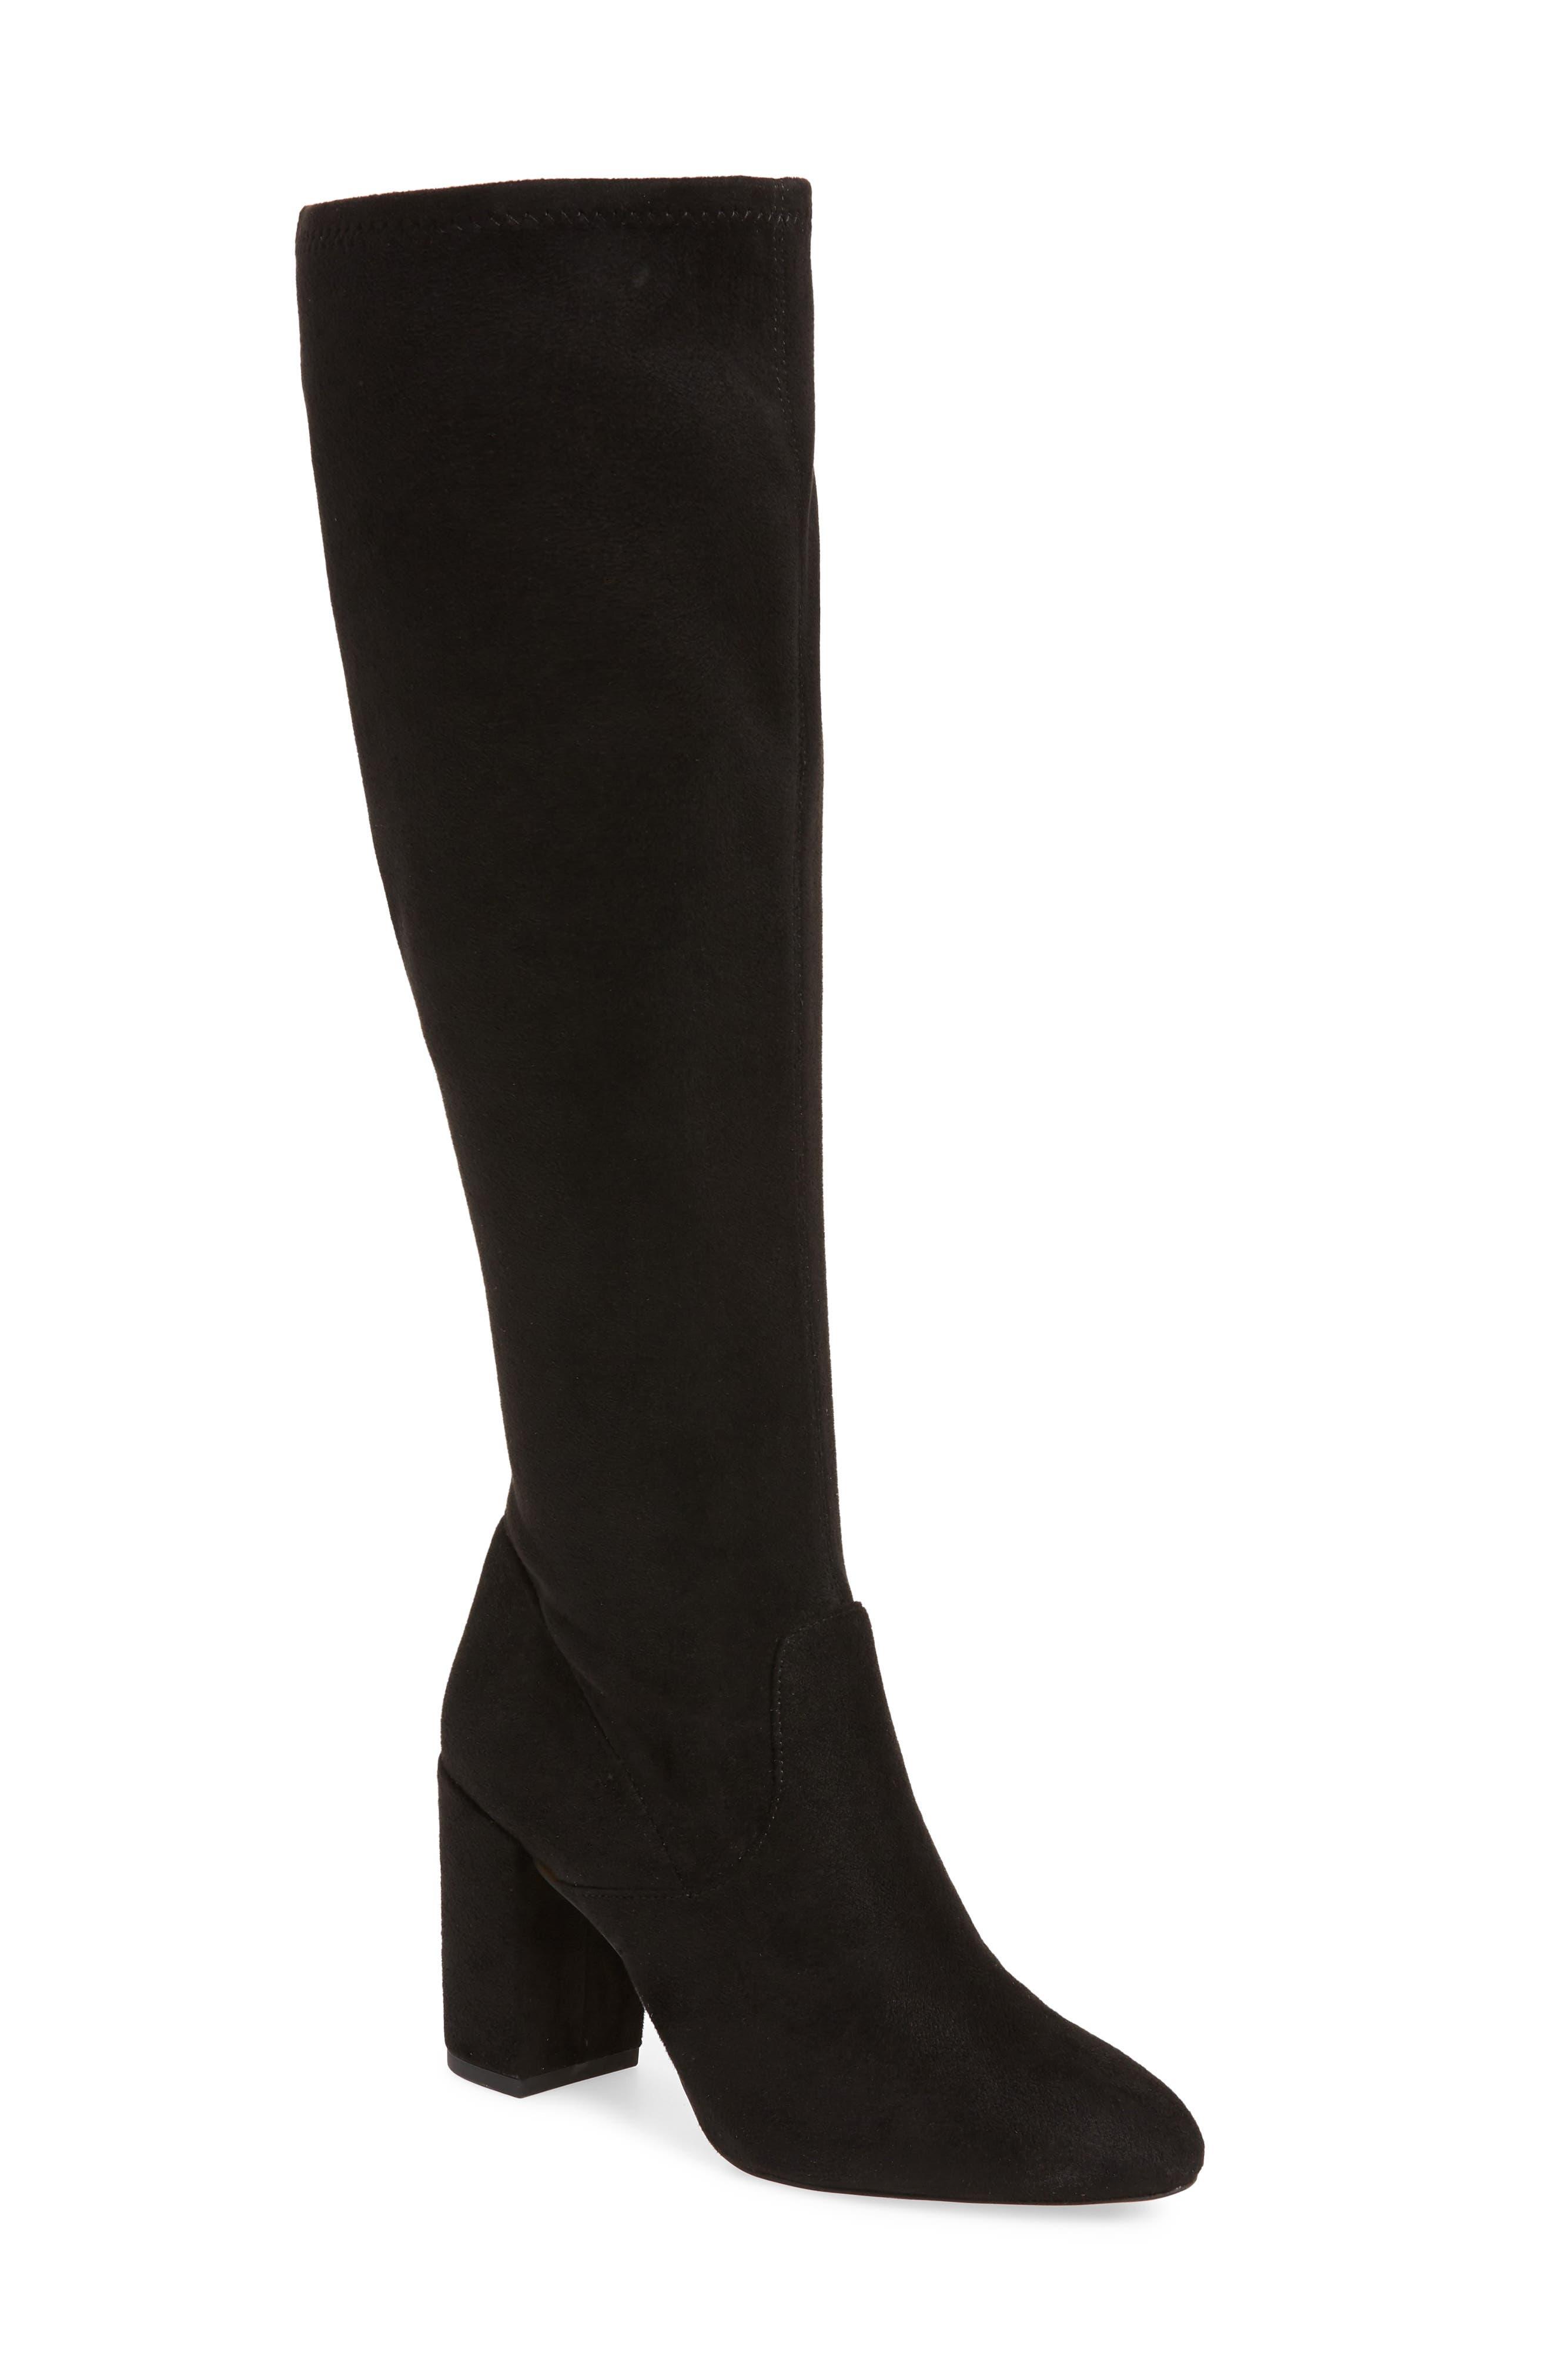 REBECCA MINKOFF, Gillian Knee High Boot, Main thumbnail 1, color, 001